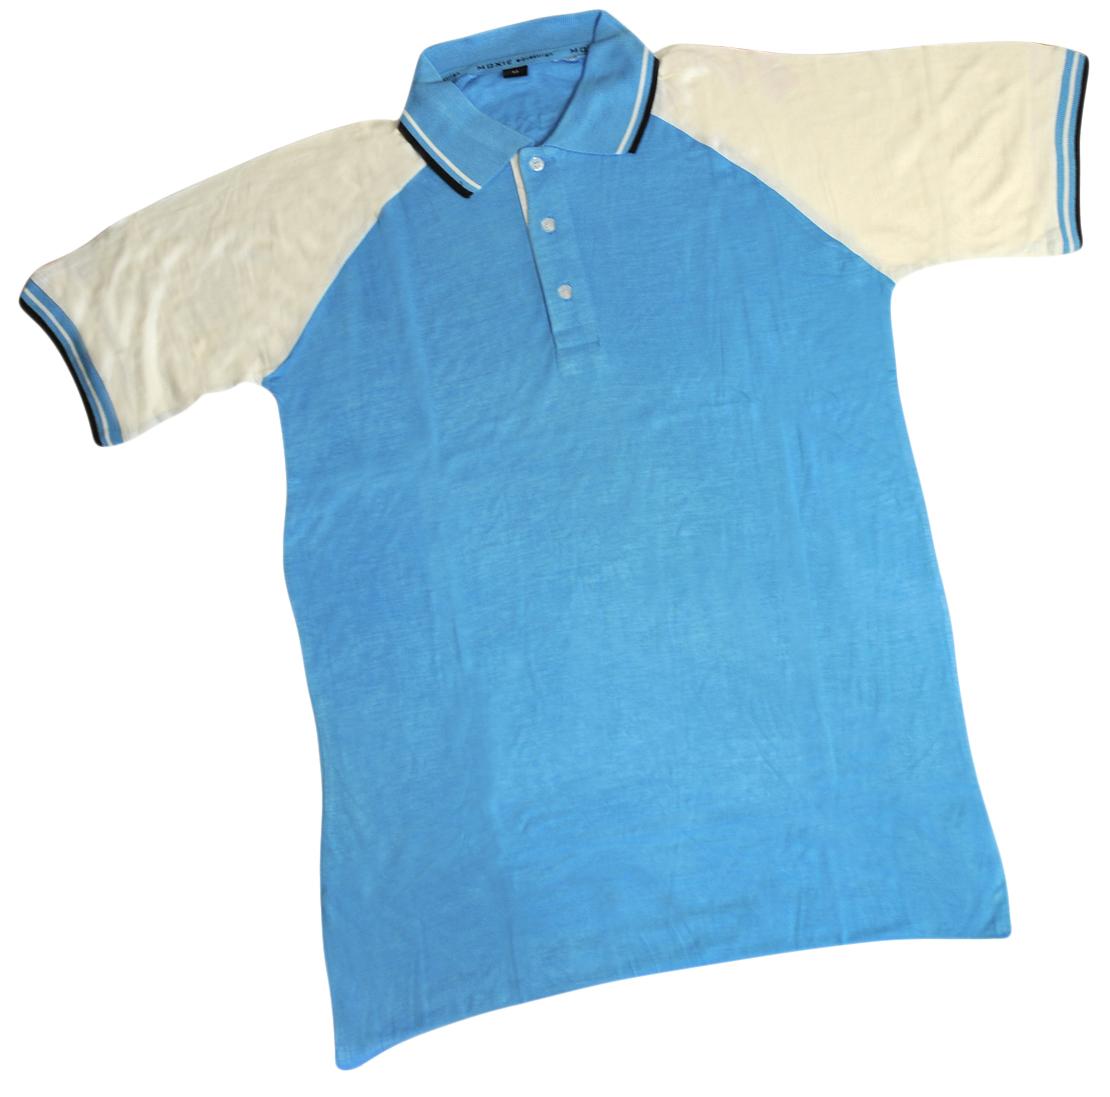 Moxie Men's Polo Shirt